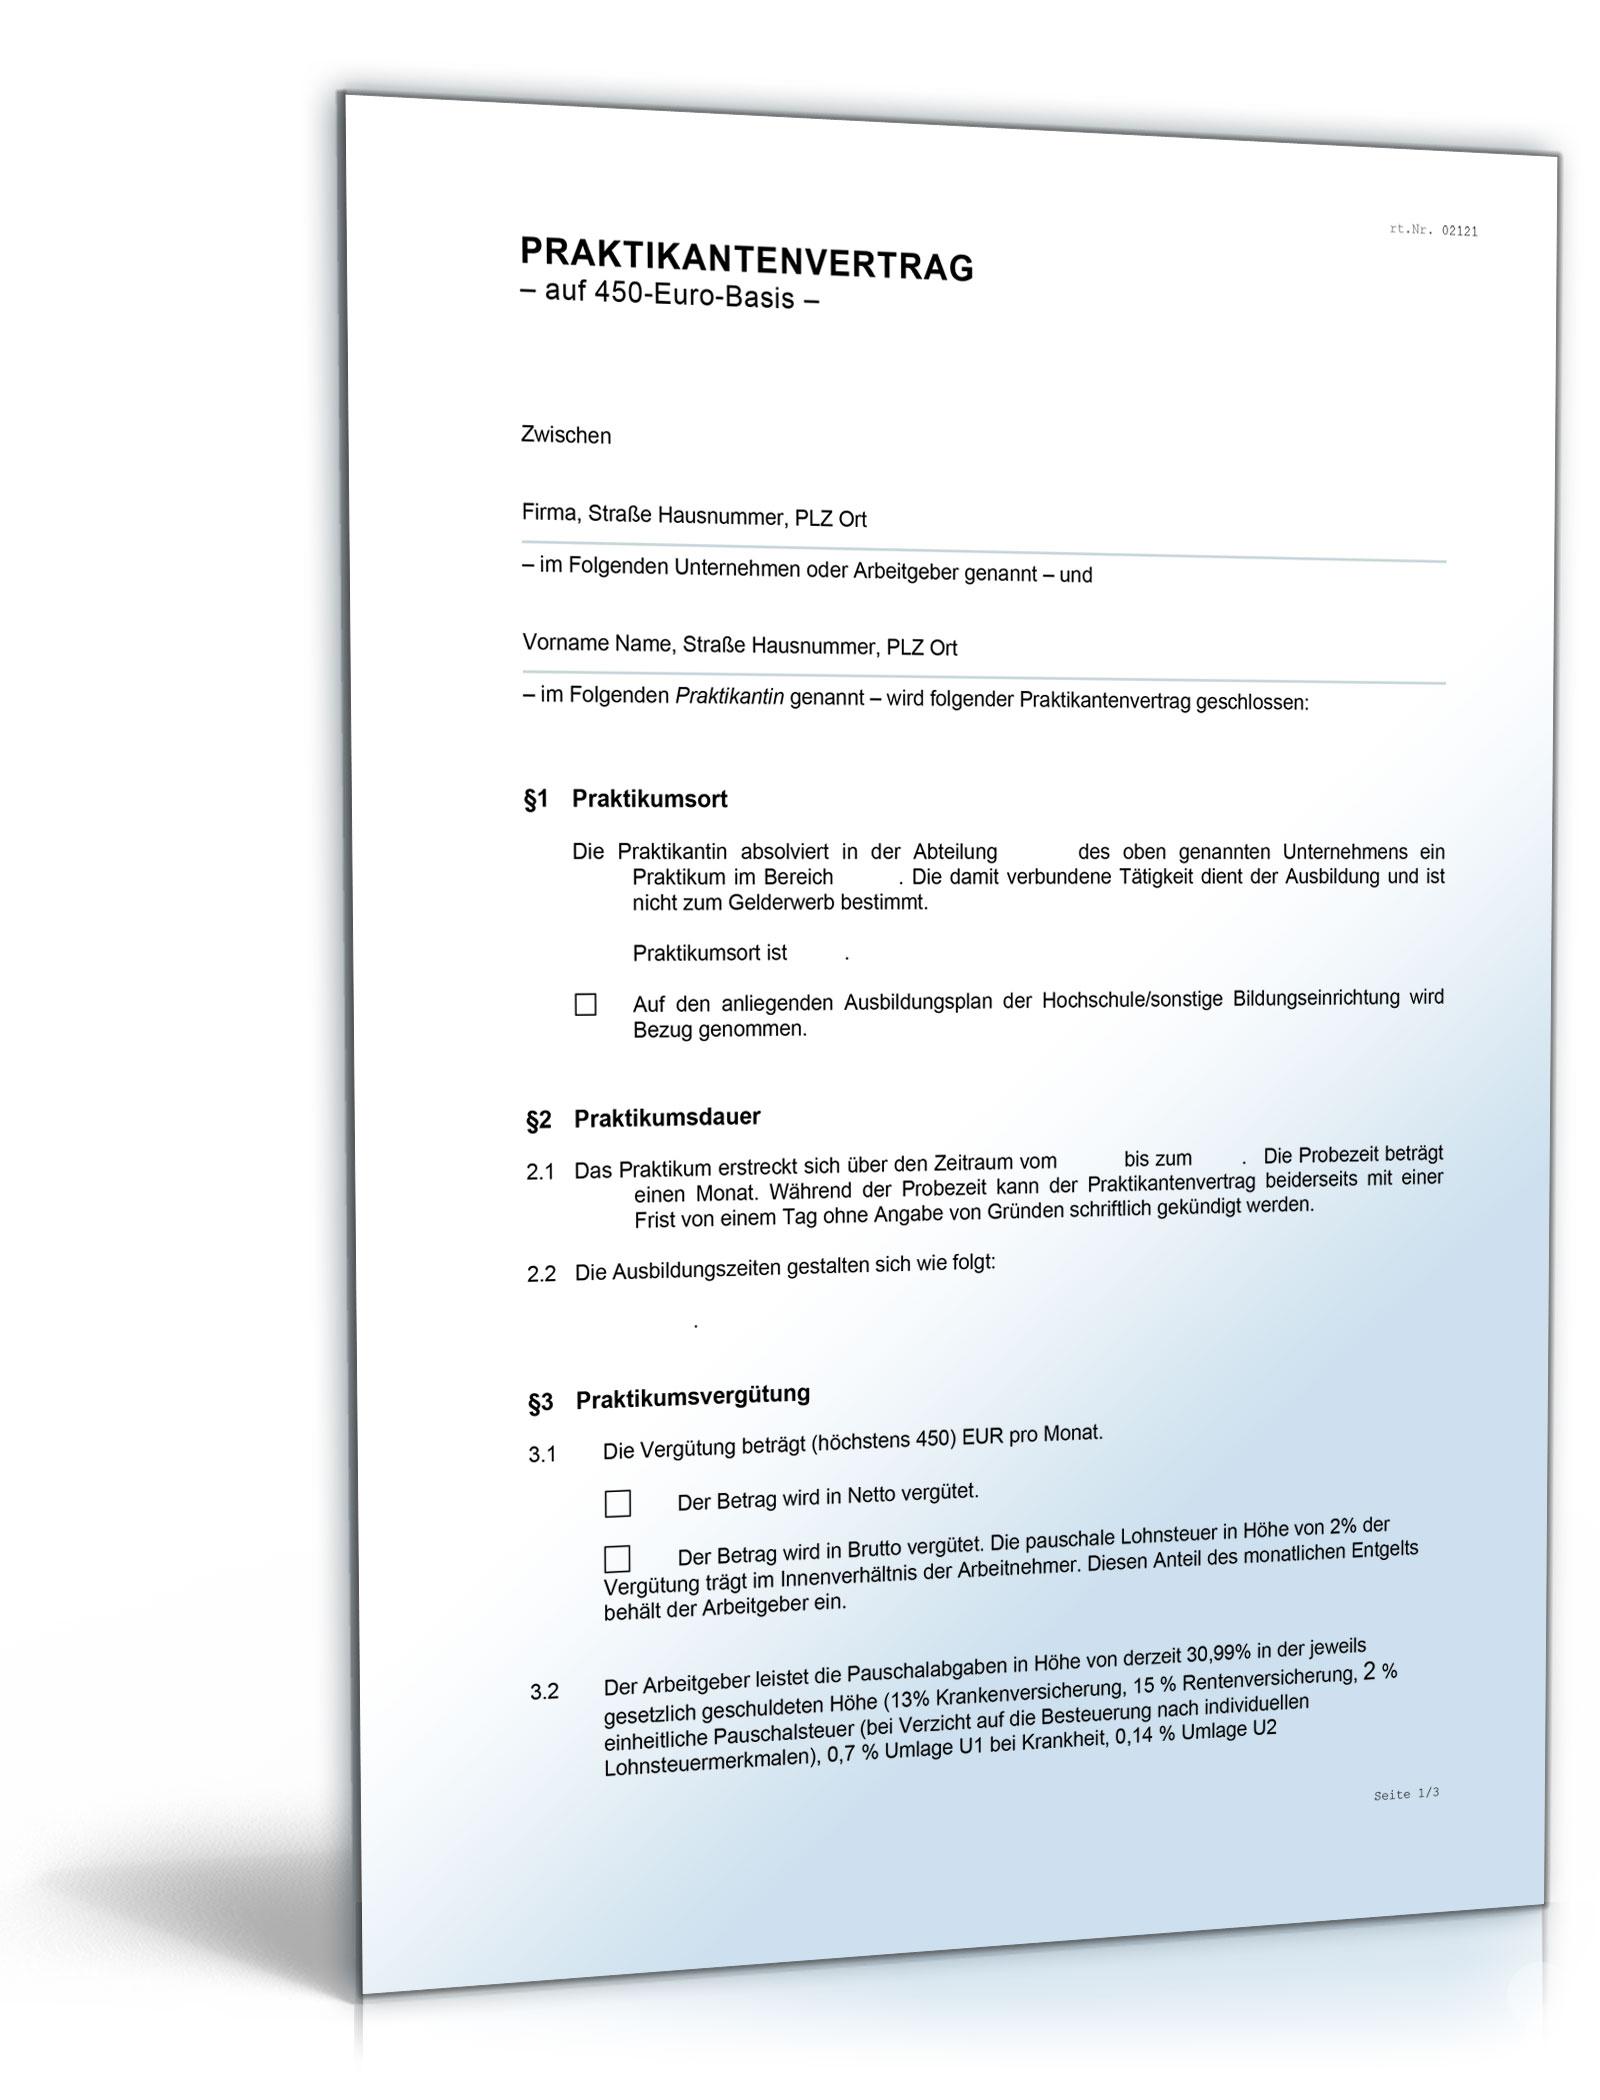 Praktikantenvertrag Auf 400 Euro Basis De Vertrag Download